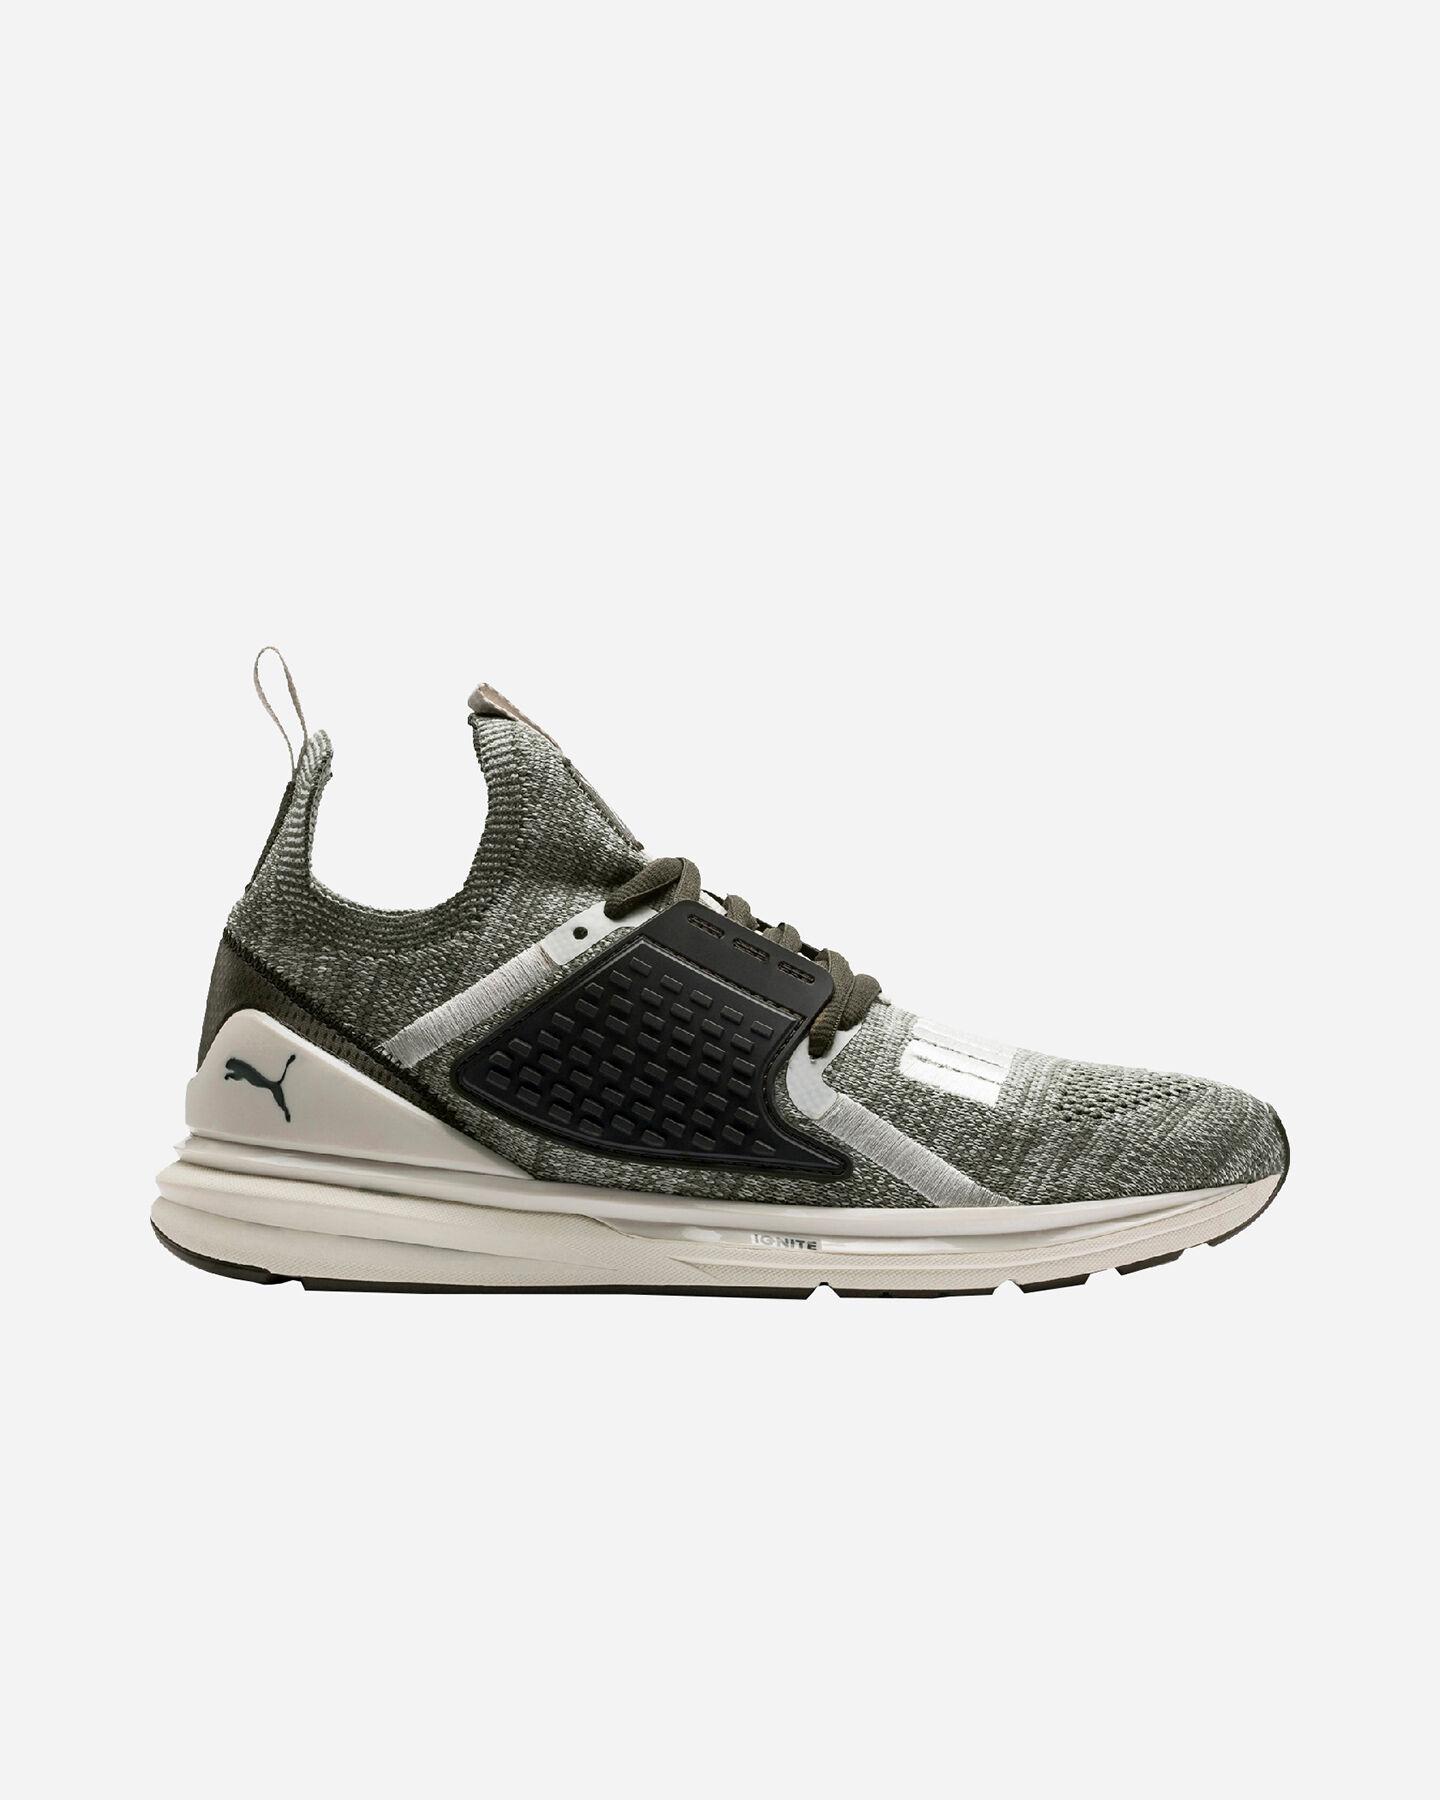 Scarpe Sneakers Puma Ignite Limitless 2 Evoknit M 191441 002